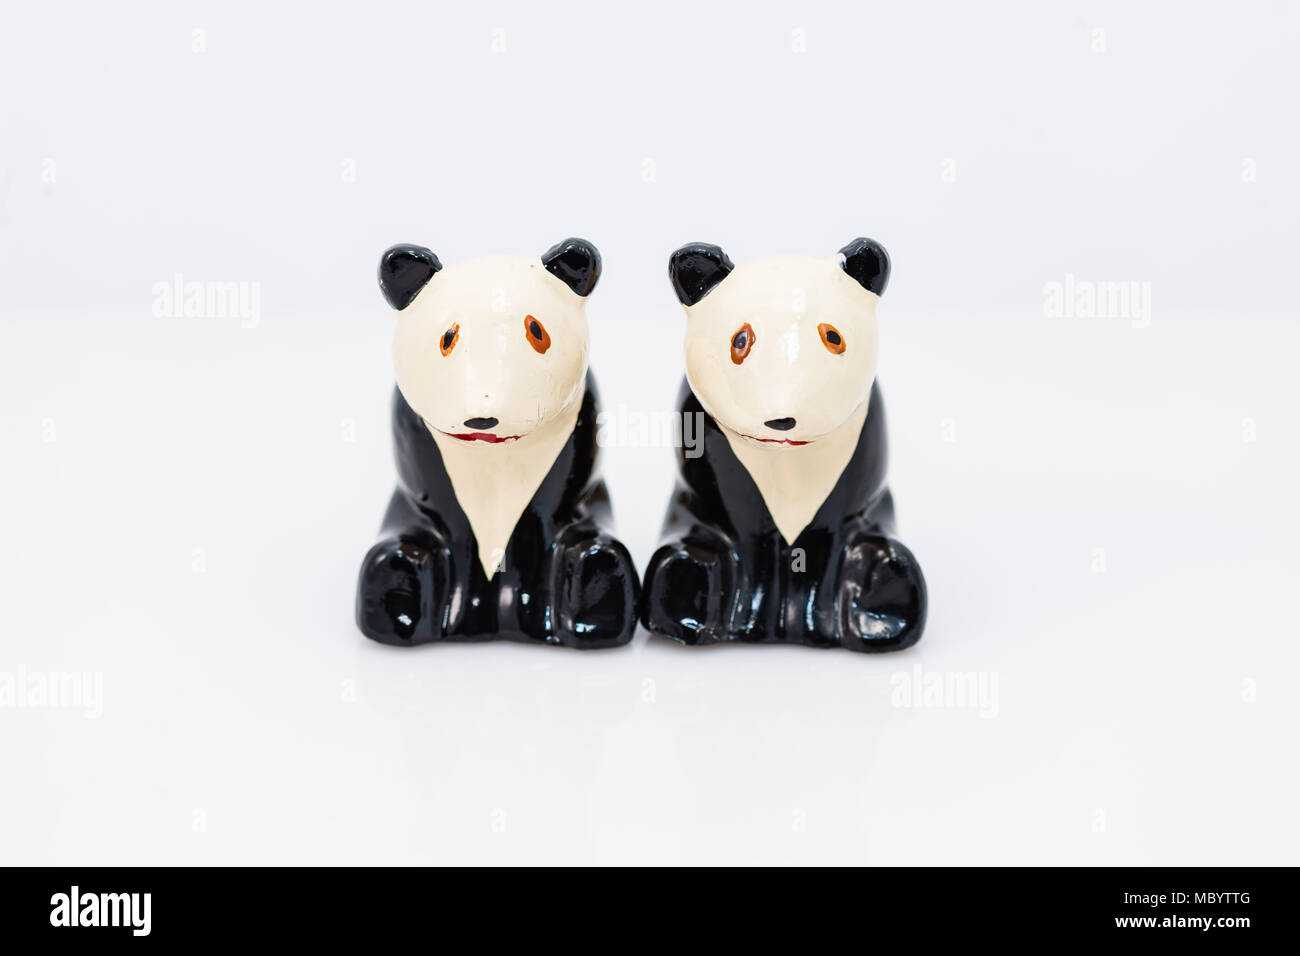 stoic panda bears salt and pepper shakers set - Stock Image